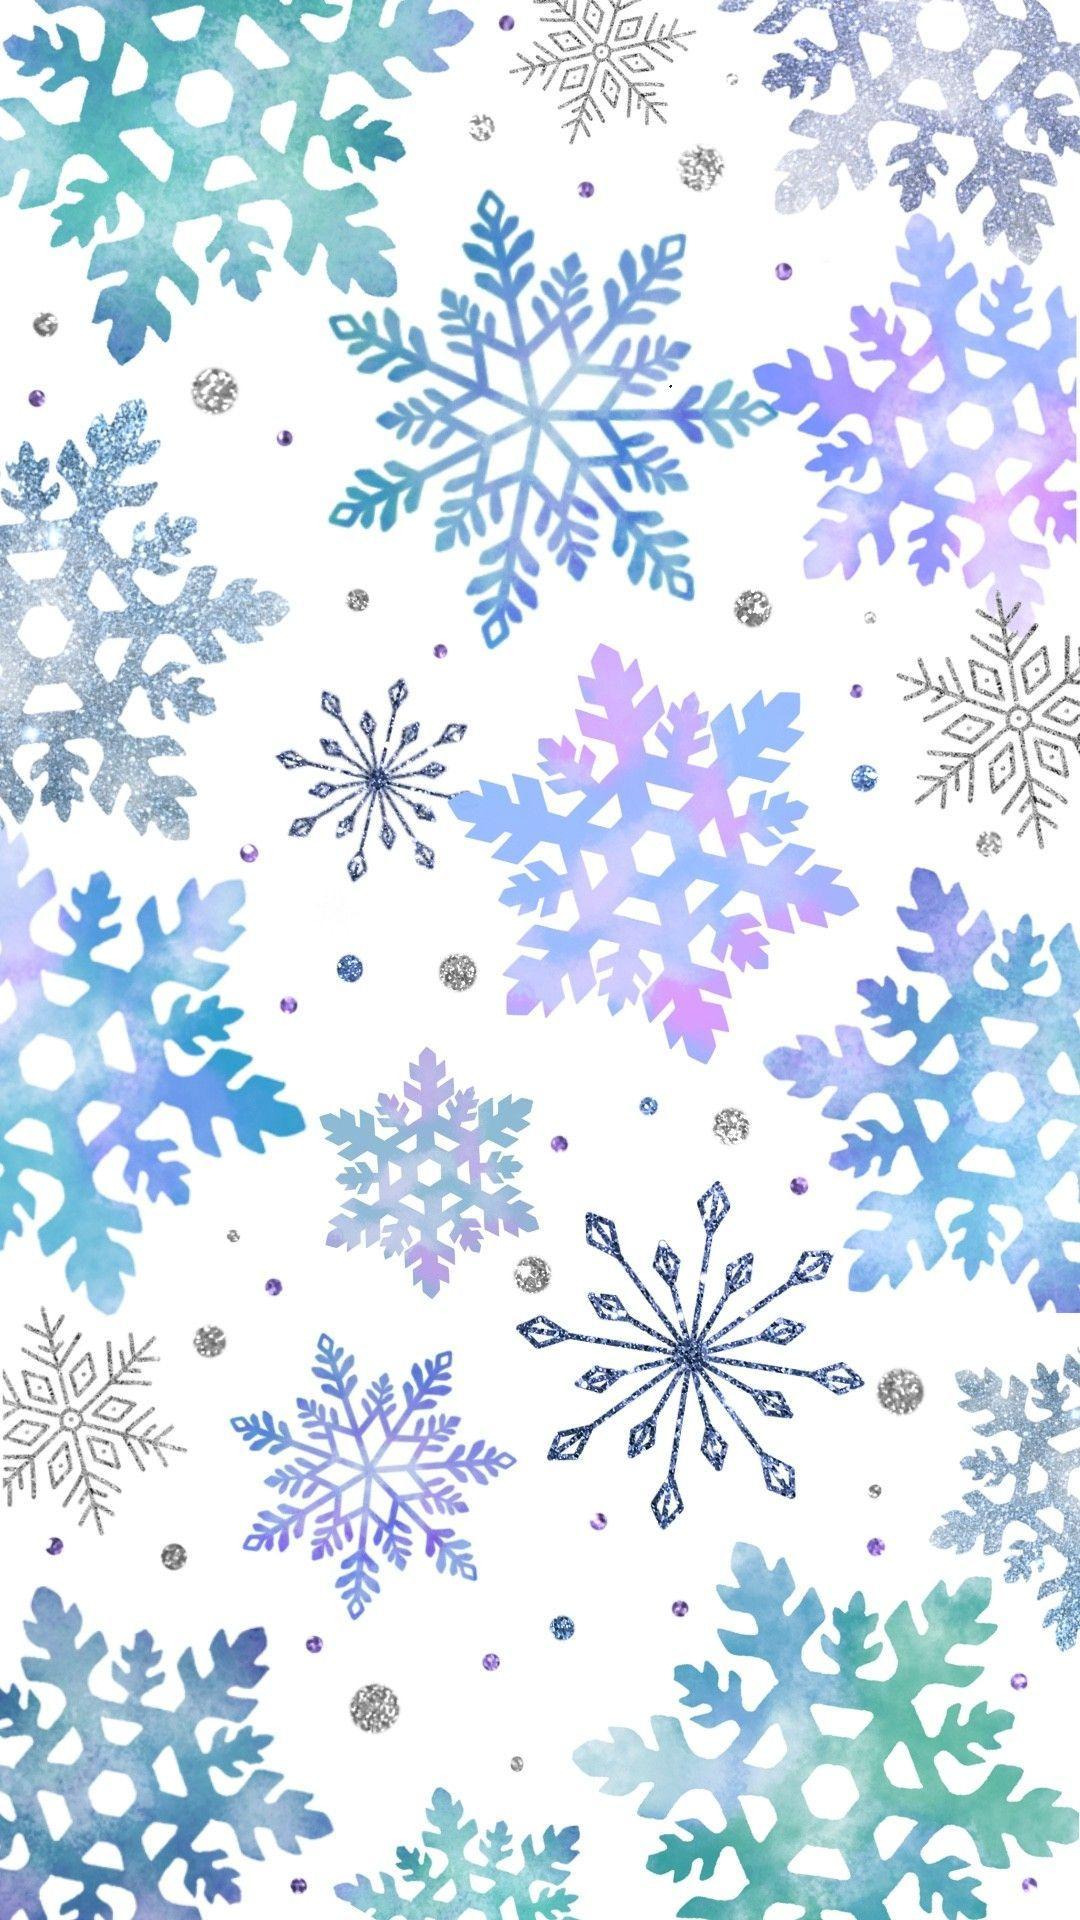 Snowflake wallpaper #winterwallpaper Winter wallpaper #winterwallpaper